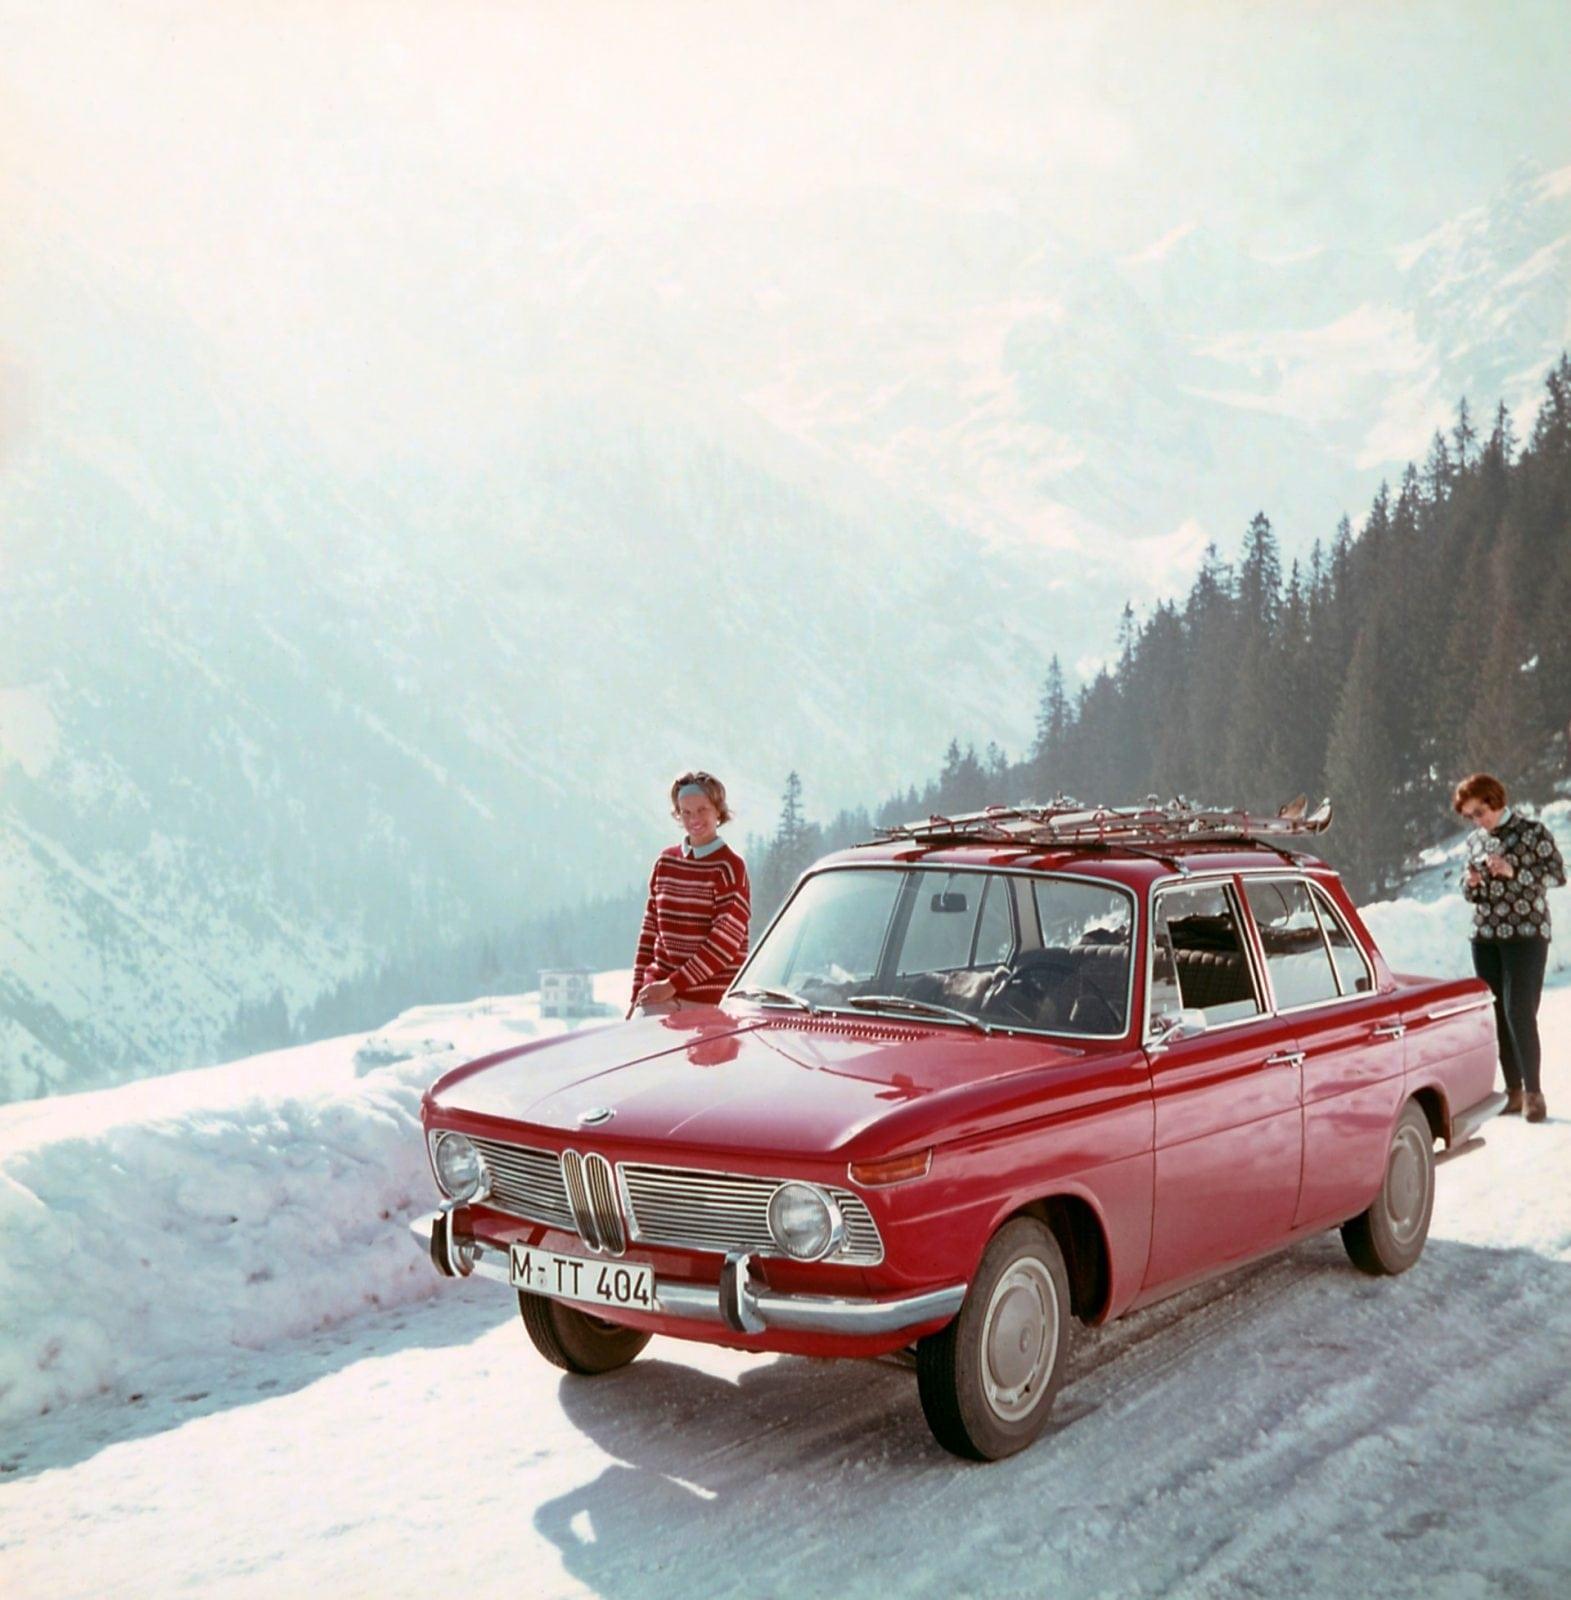 50 Years of BMW New Class, BMW 1500 (03/2011)